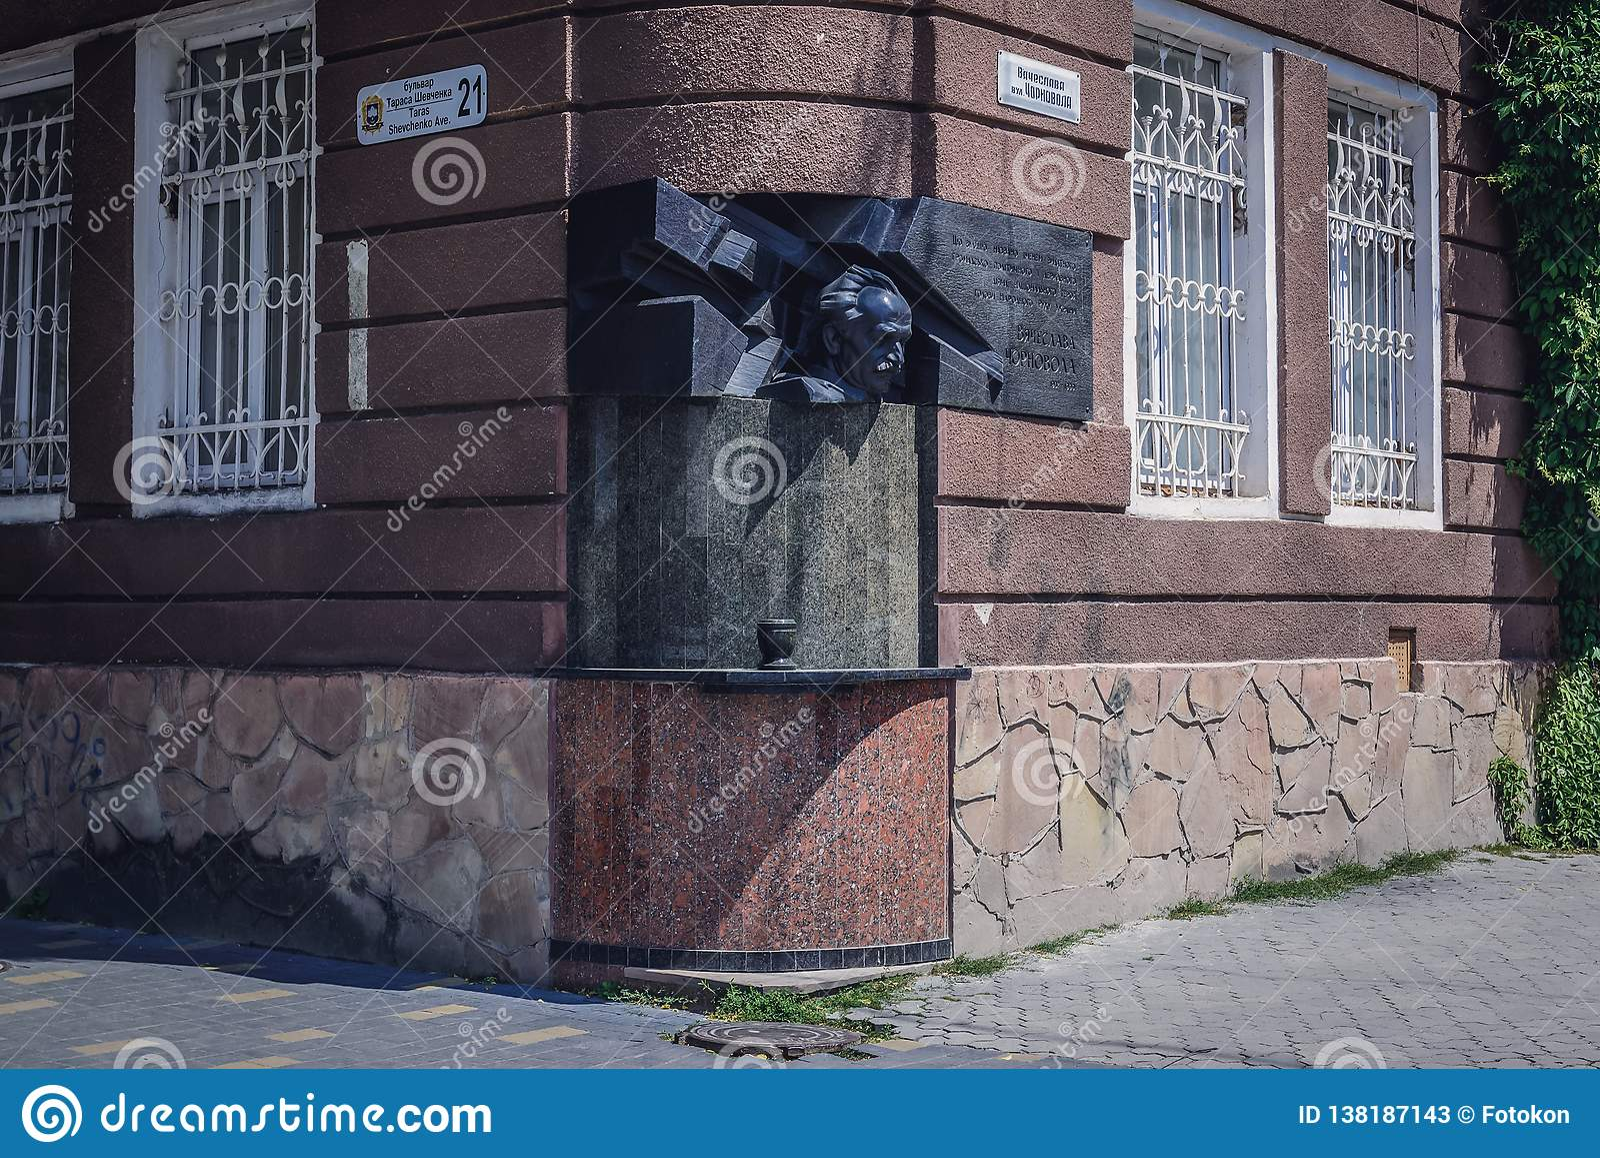 Ternopil in Ucraina